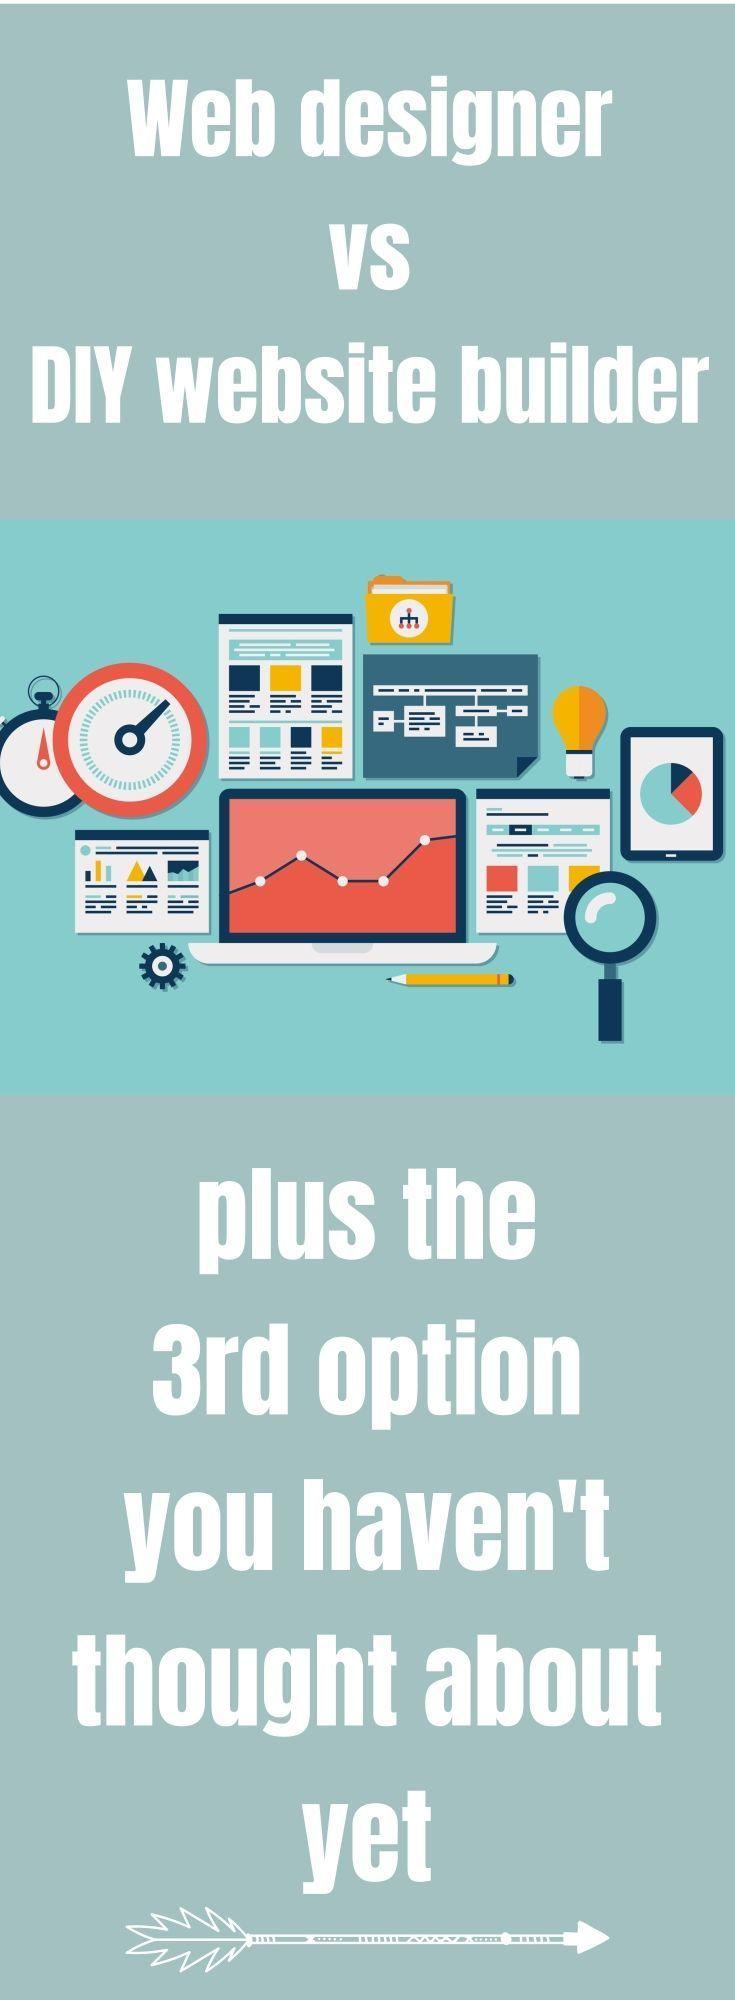 Web designer vs do it yourself website builders website and blogging small business marketing web designer vs do it yourself solutioingenieria Choice Image